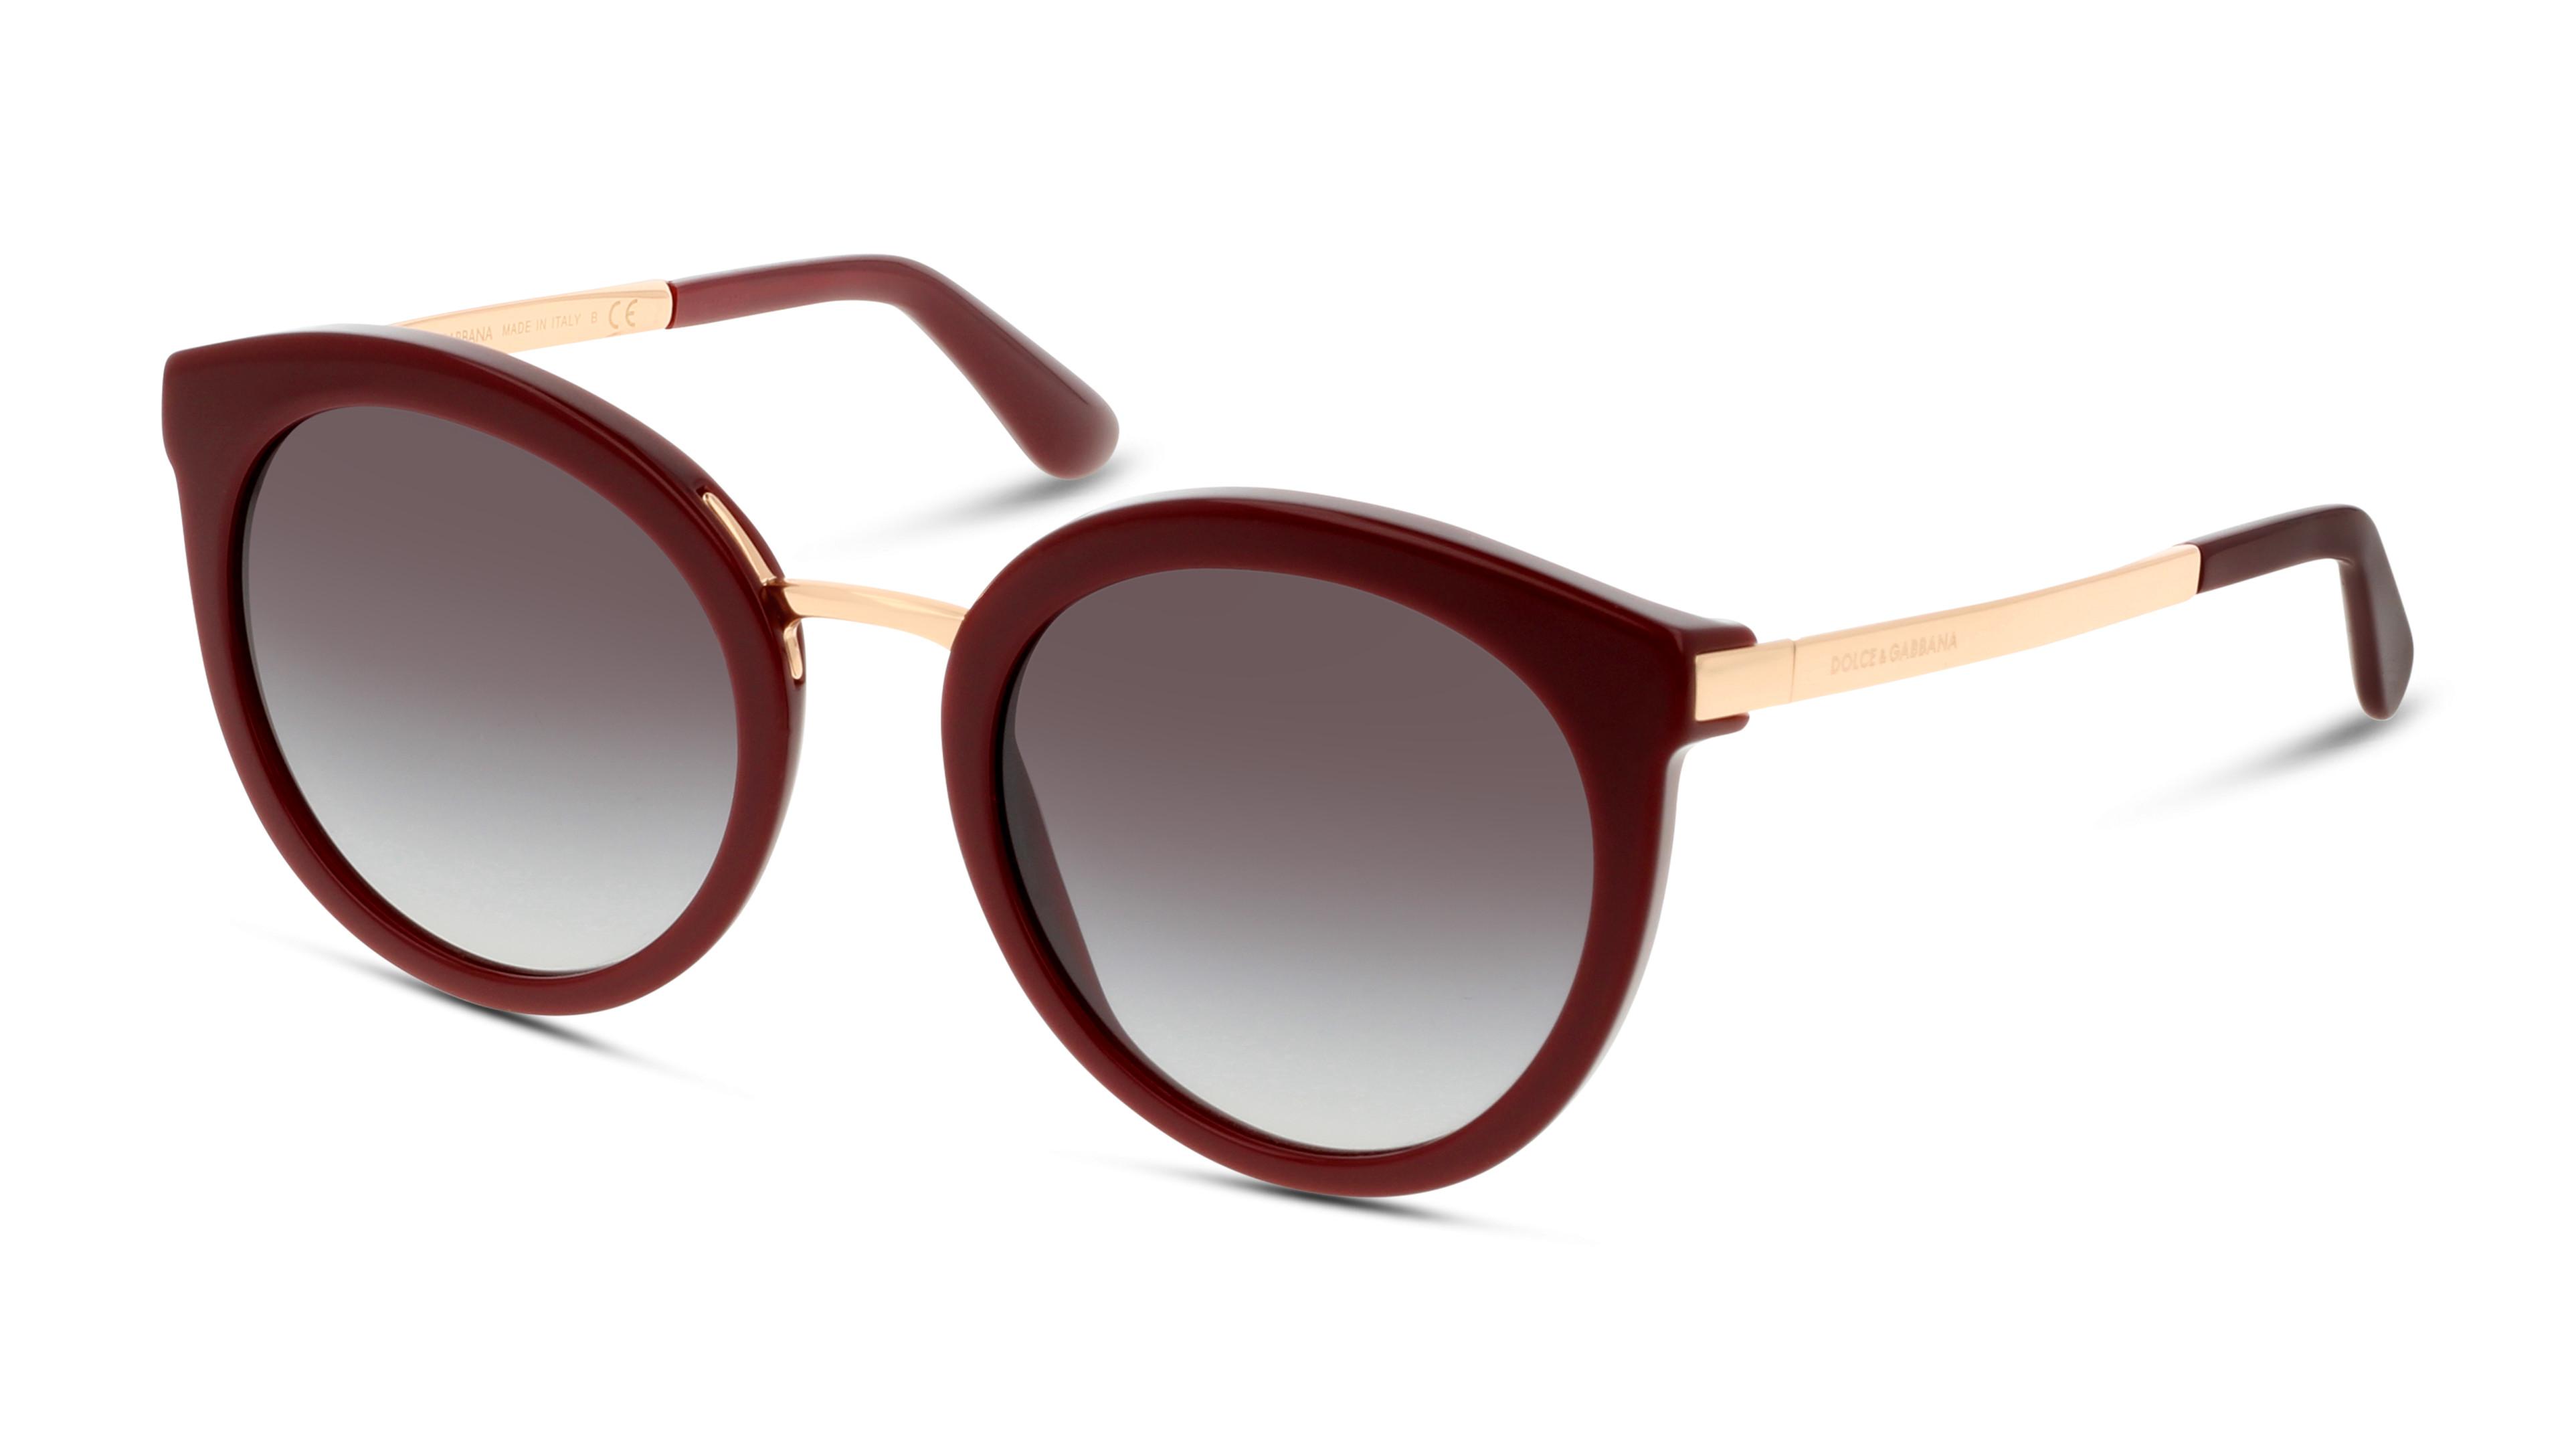 8053672956245-angle-03-dolce-and-gabbana-dg4268-Eyewear-bordeaux